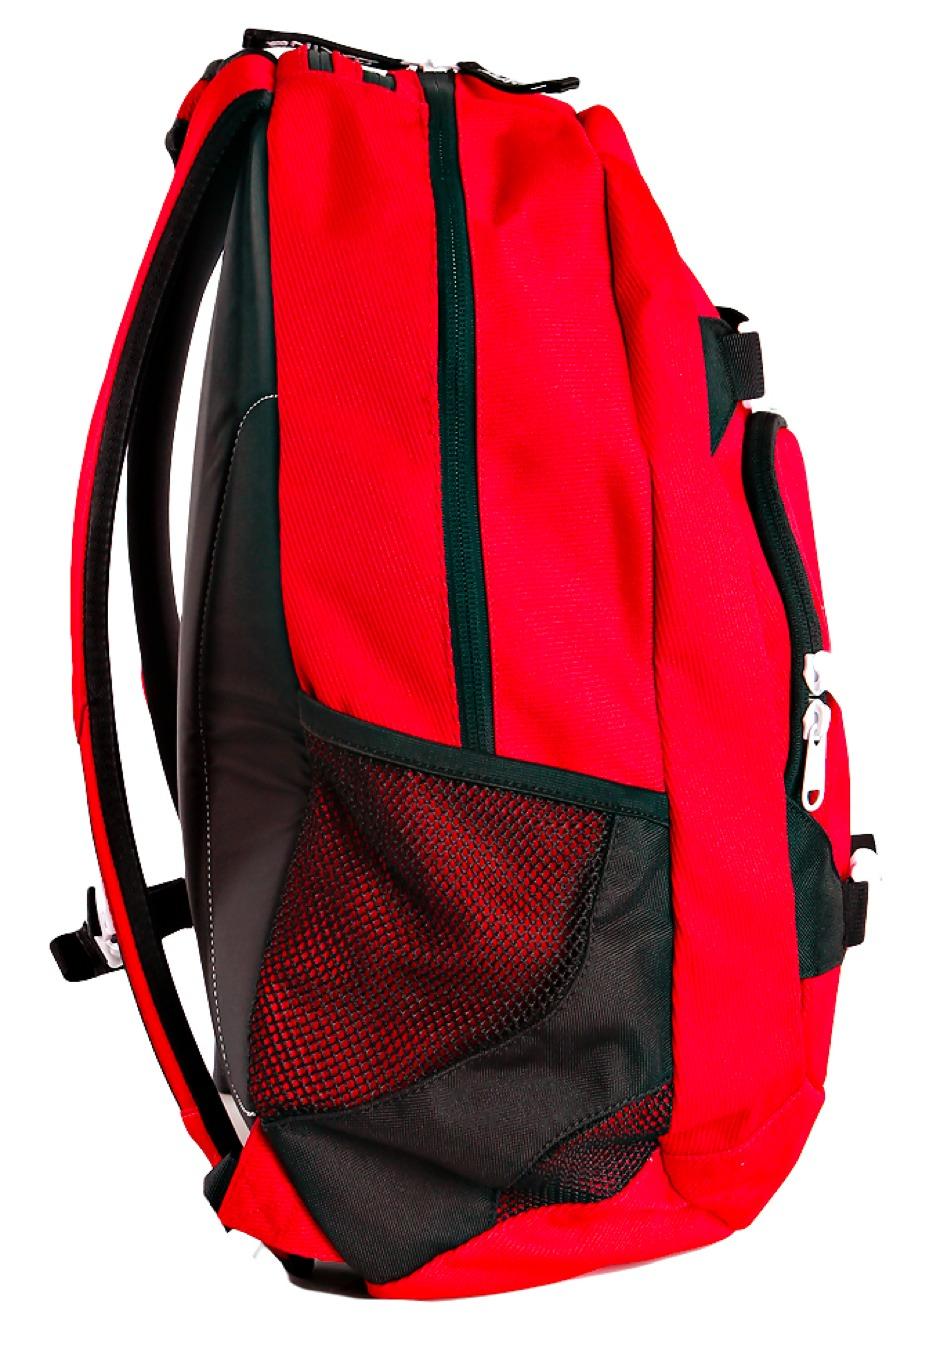 Dakine - Explorer Pack Red - Backpack - Impericon.com